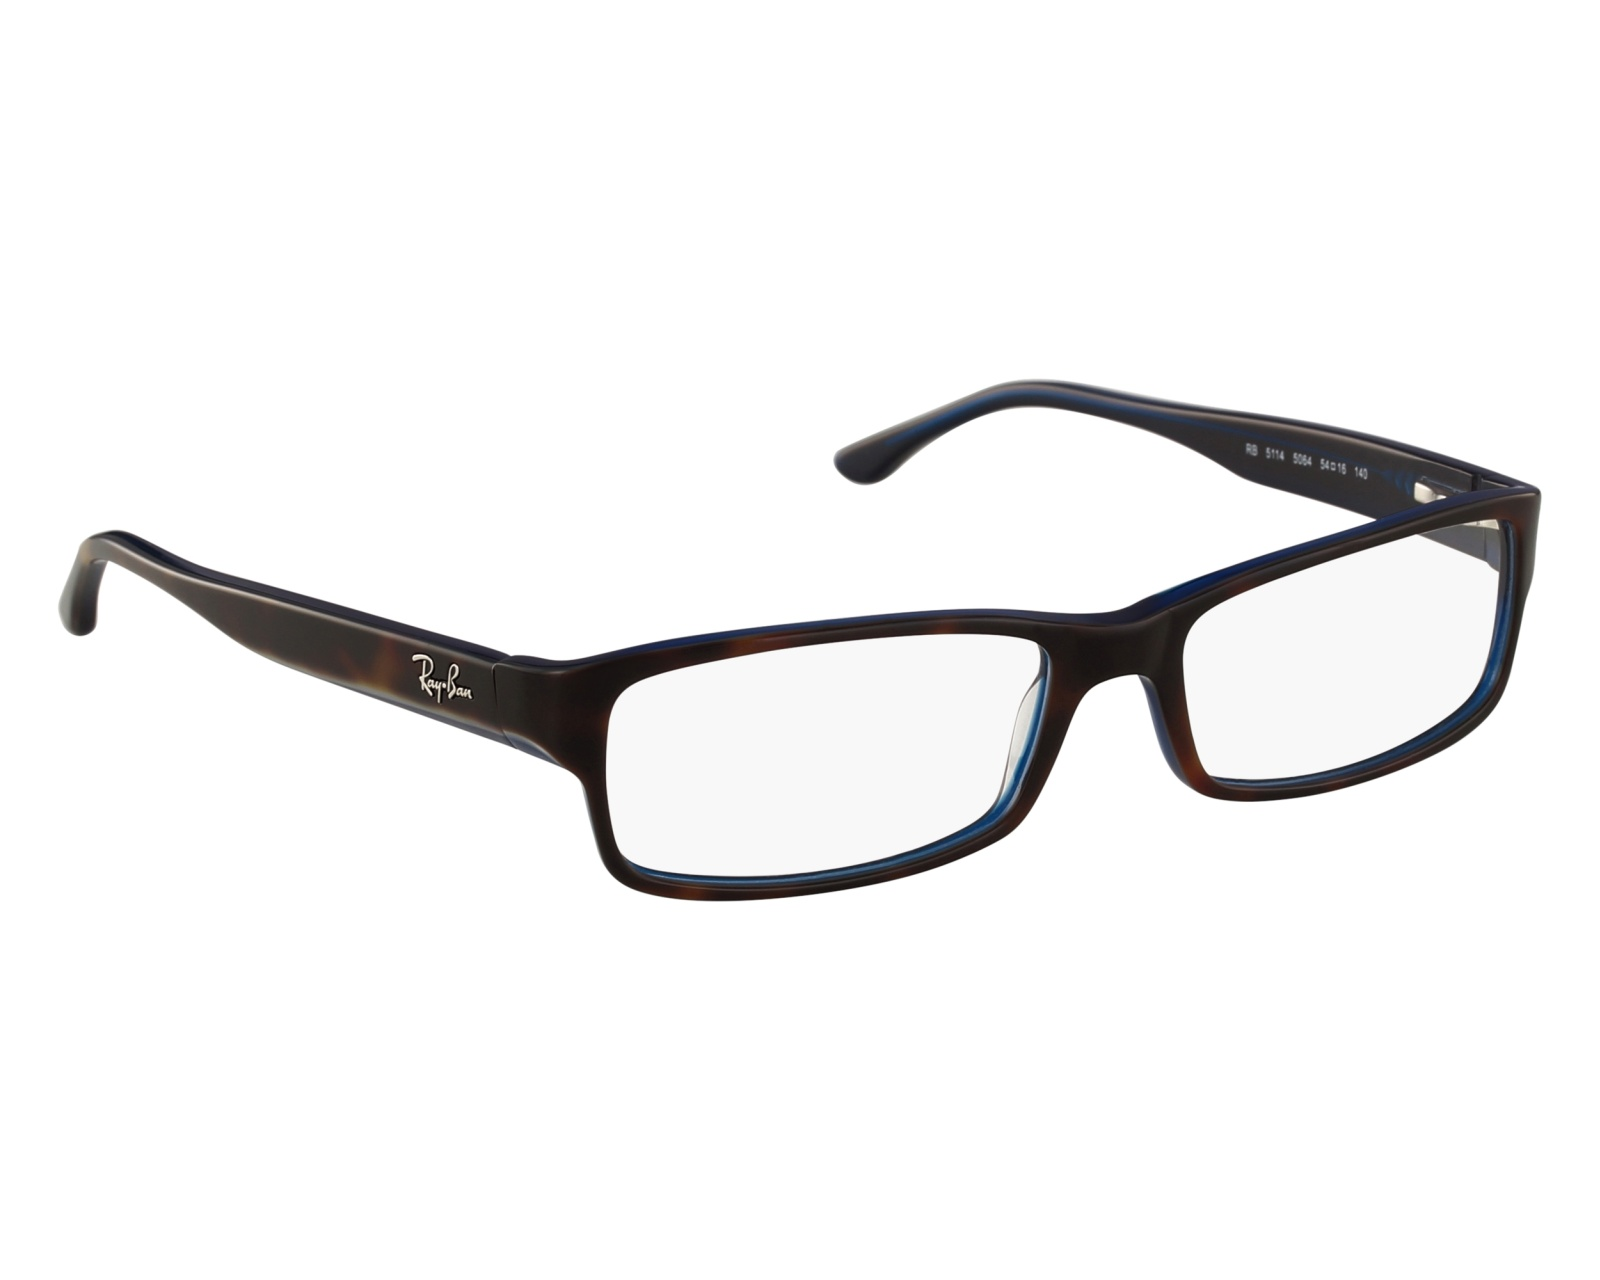 eyeglasses Ray-Ban RX-5114 5064 52-16 Havana Blue front view 7382ef676fa0